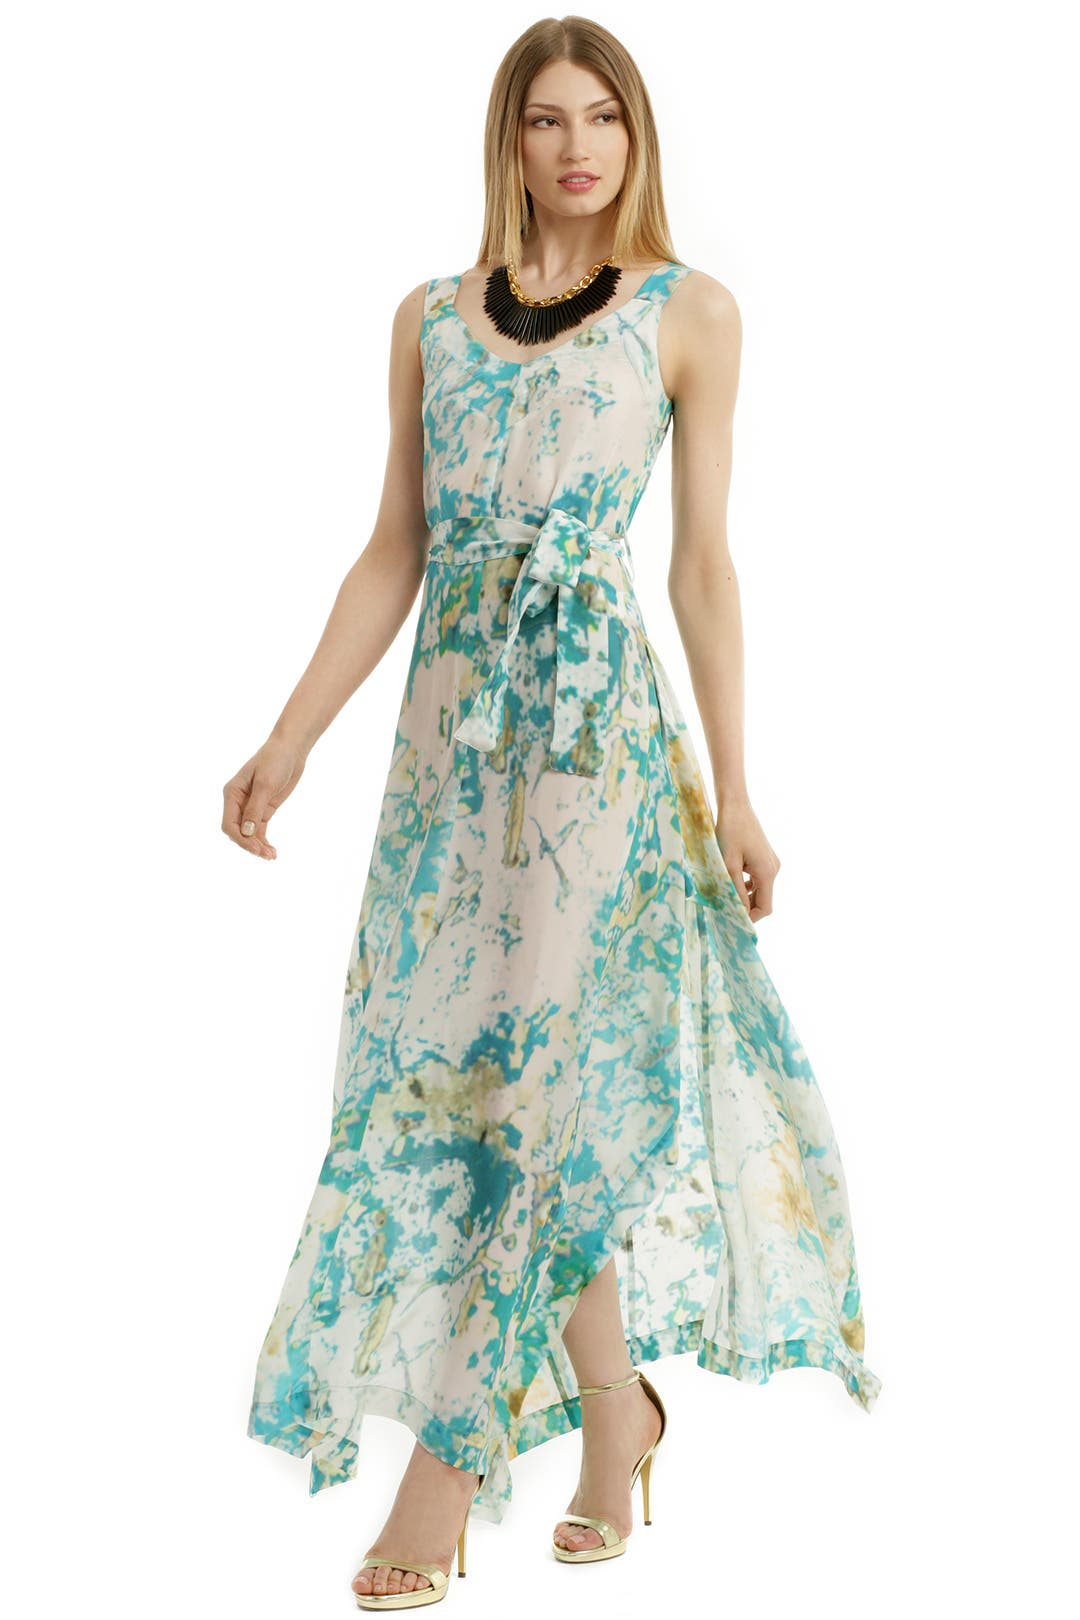 Vivienne Westwood Anglomania Zeta Maxi Dress